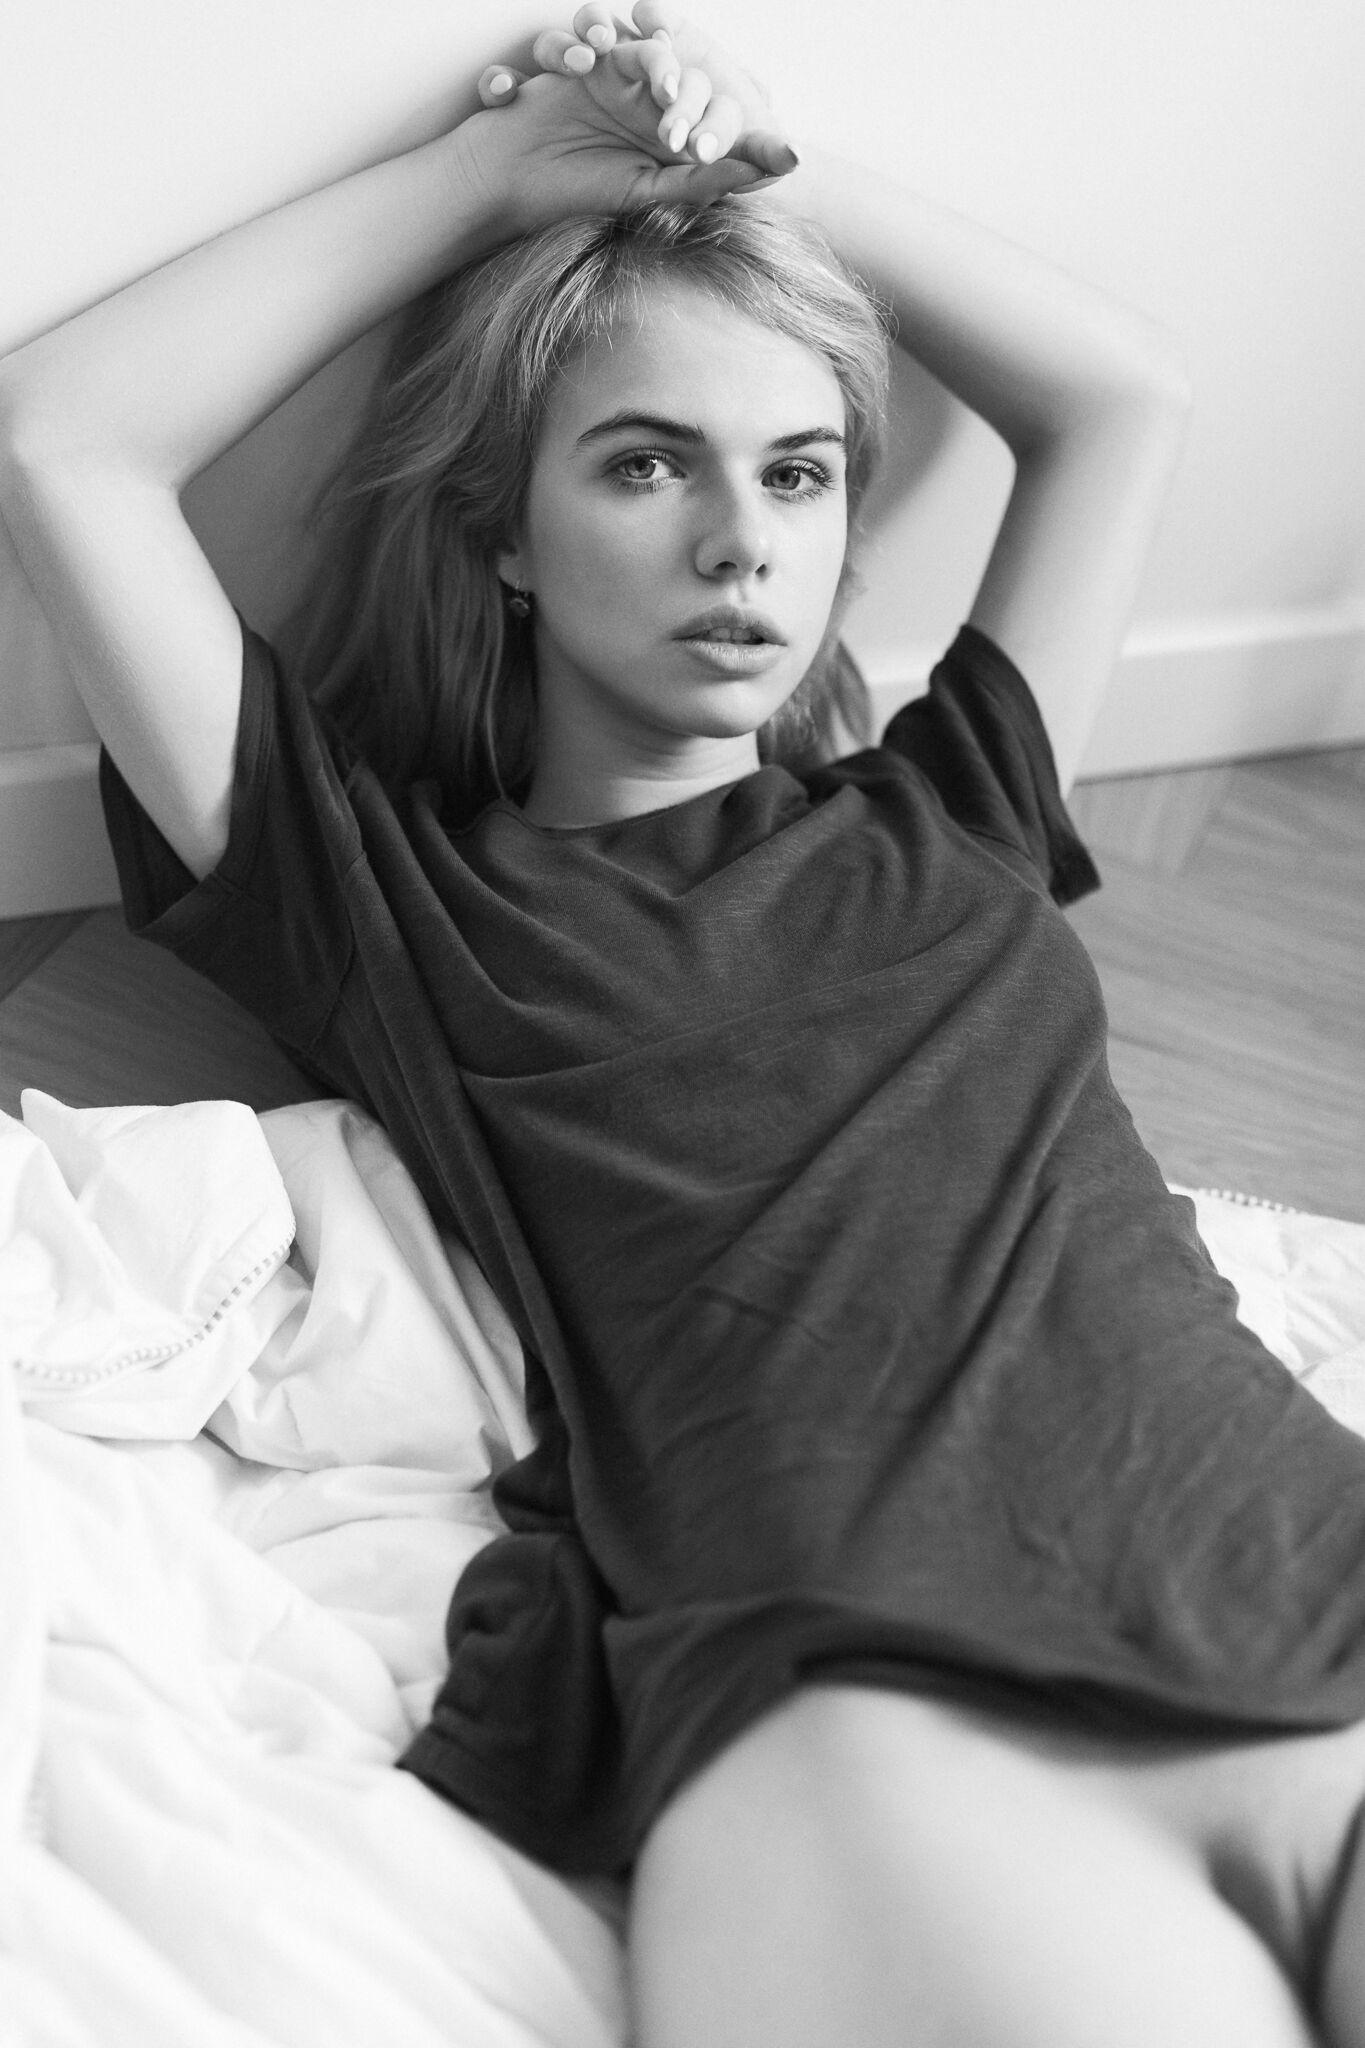 Brooke shields nude photograph